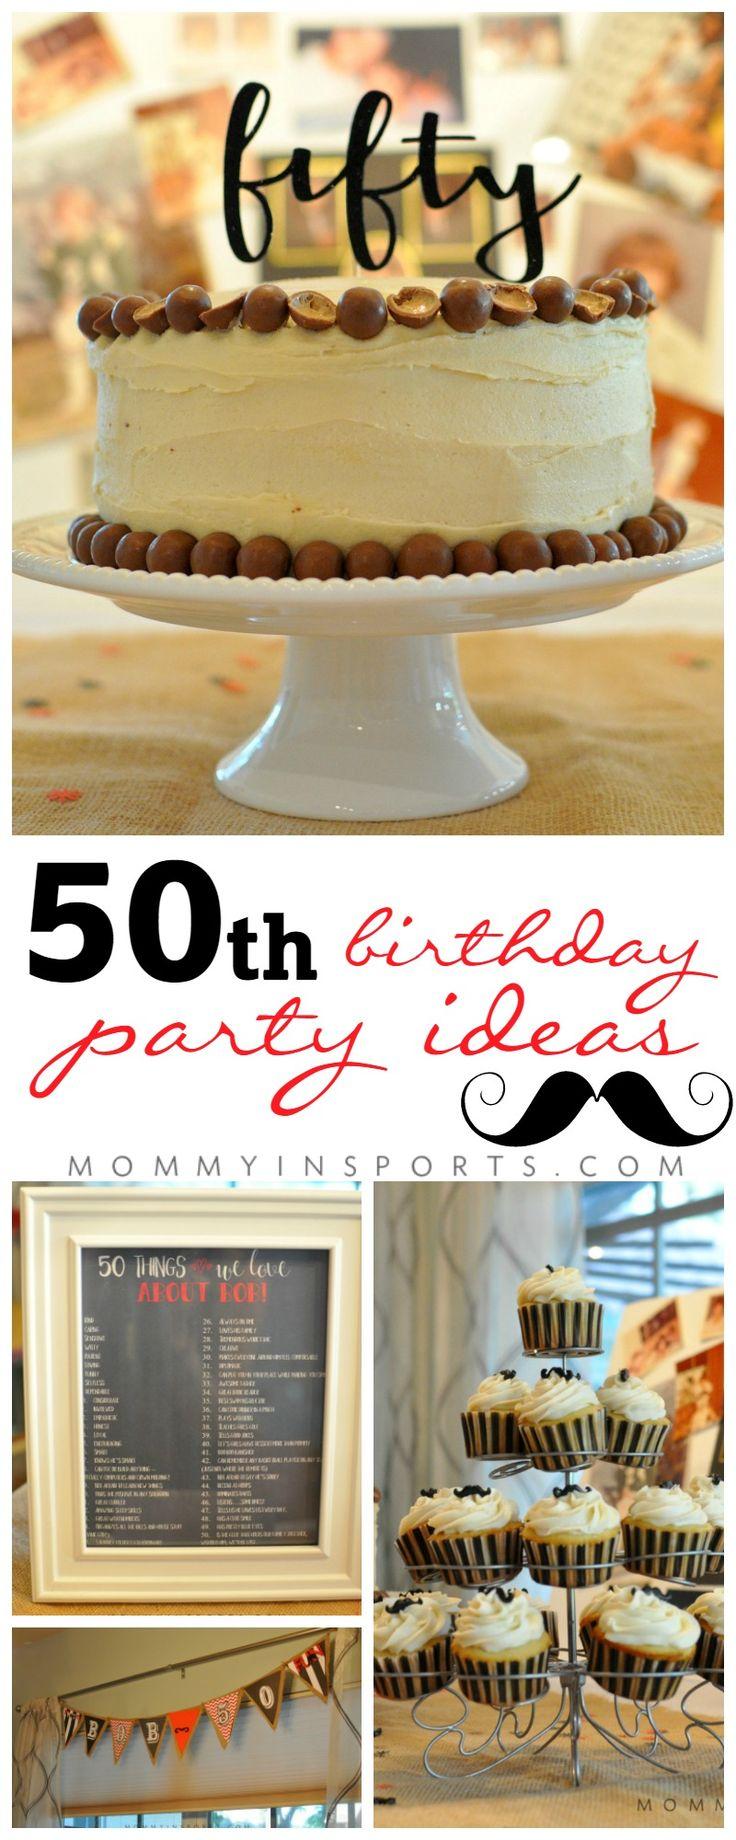 Best 25+ 50th birthday favors ideas on Pinterest